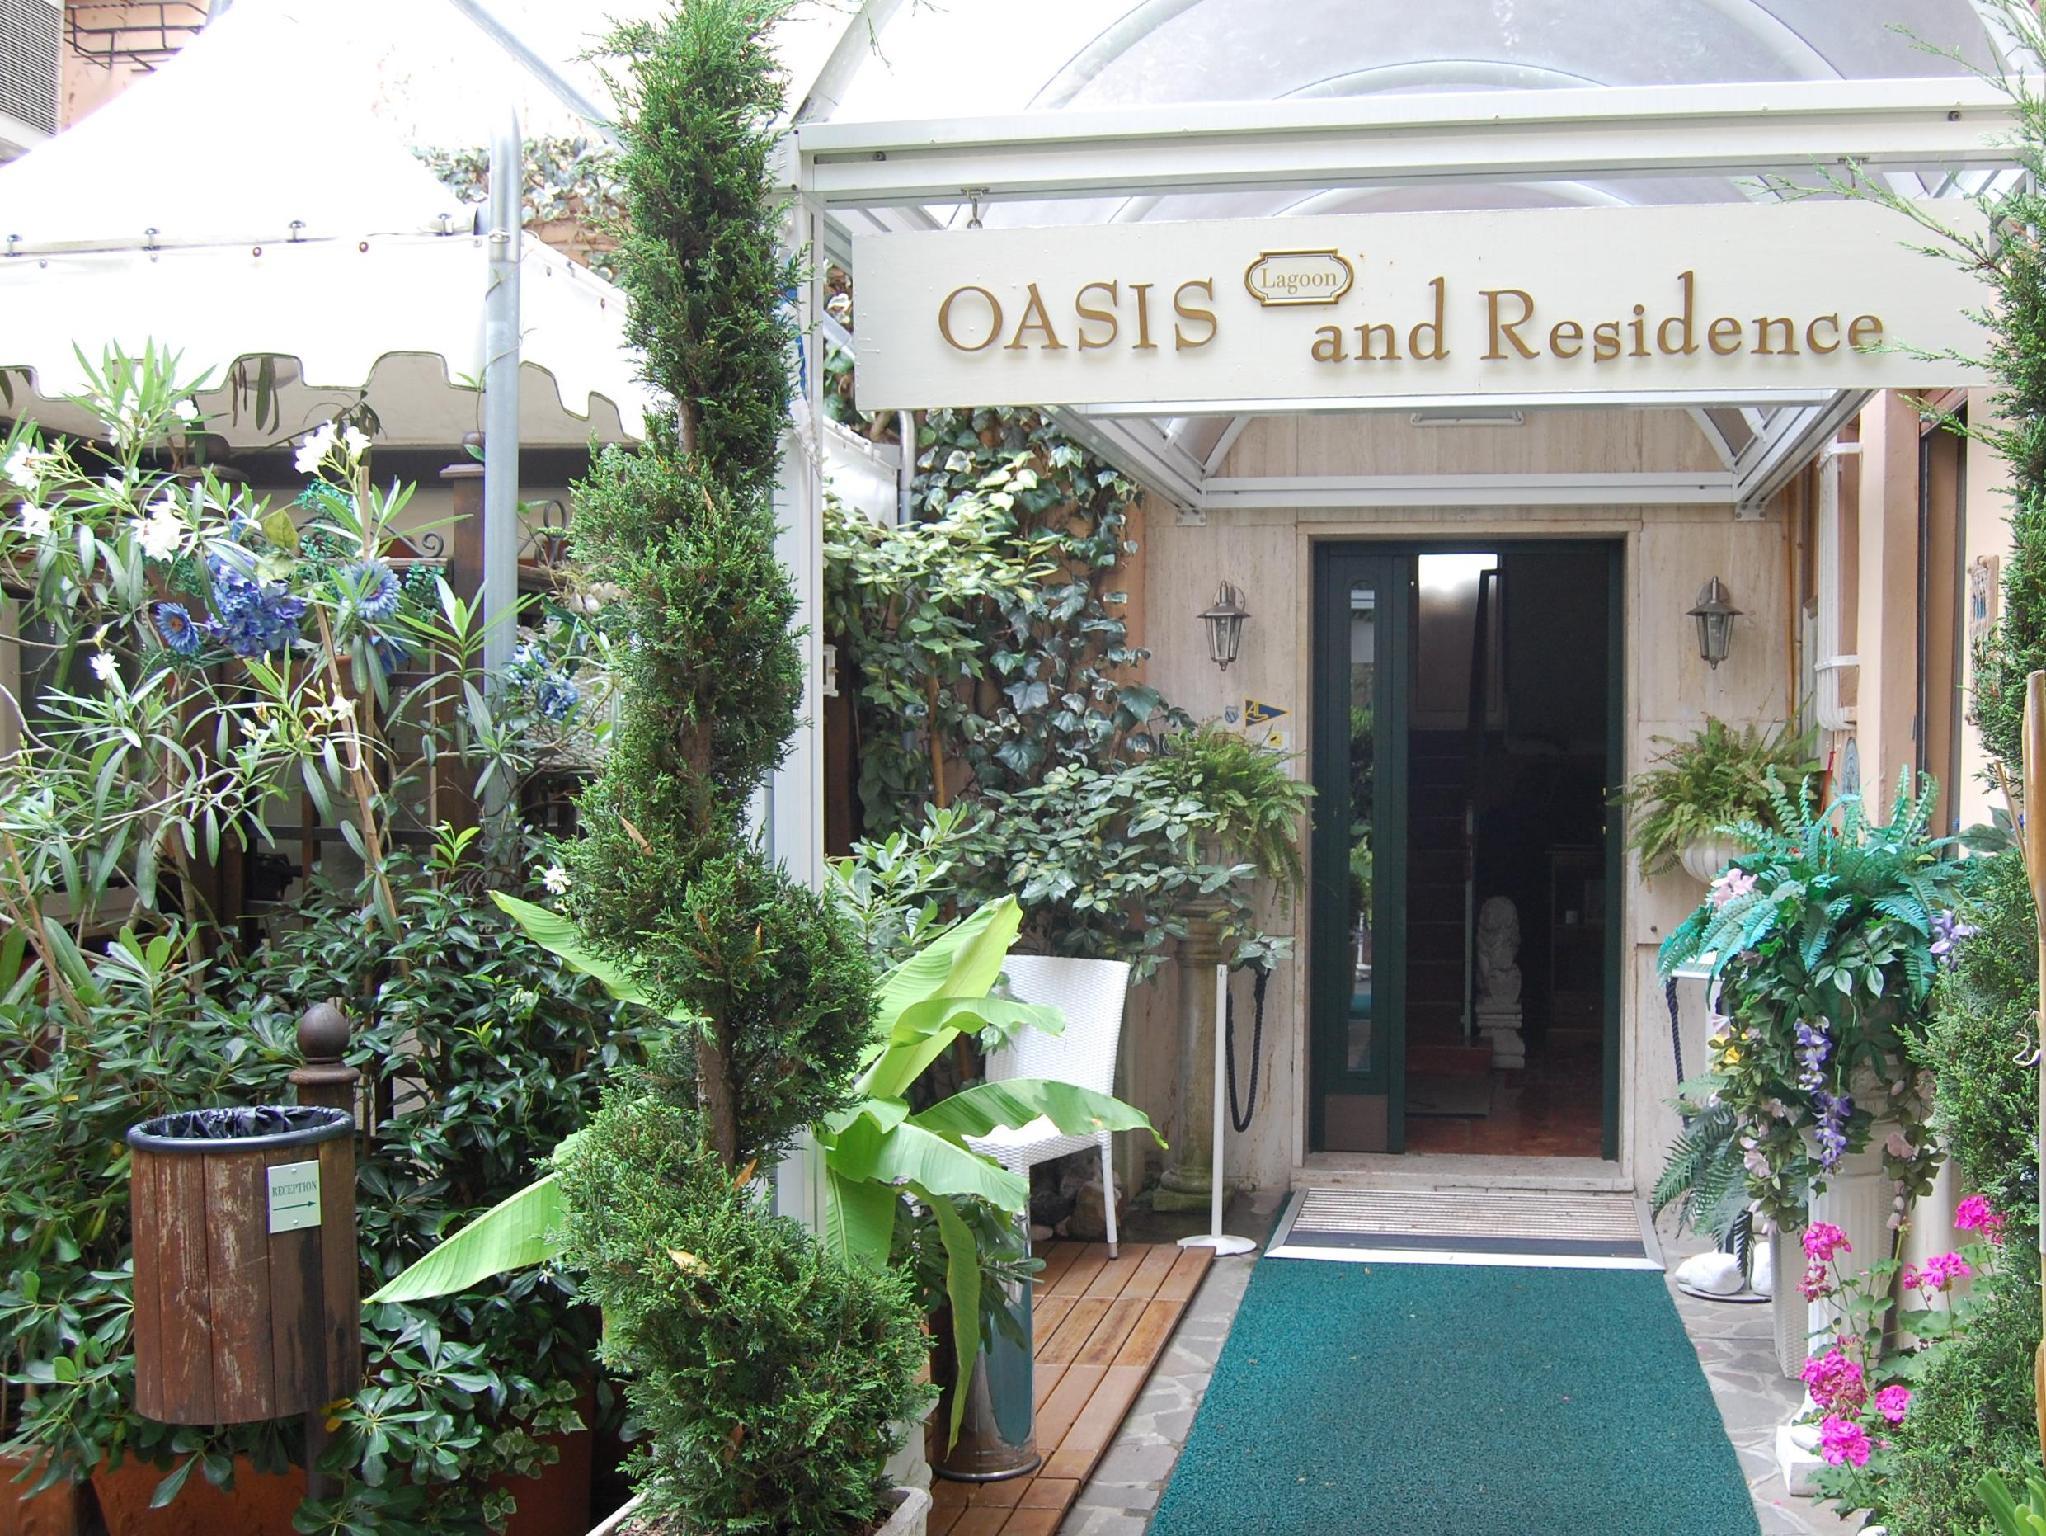 Oasis Lagoon And Residence